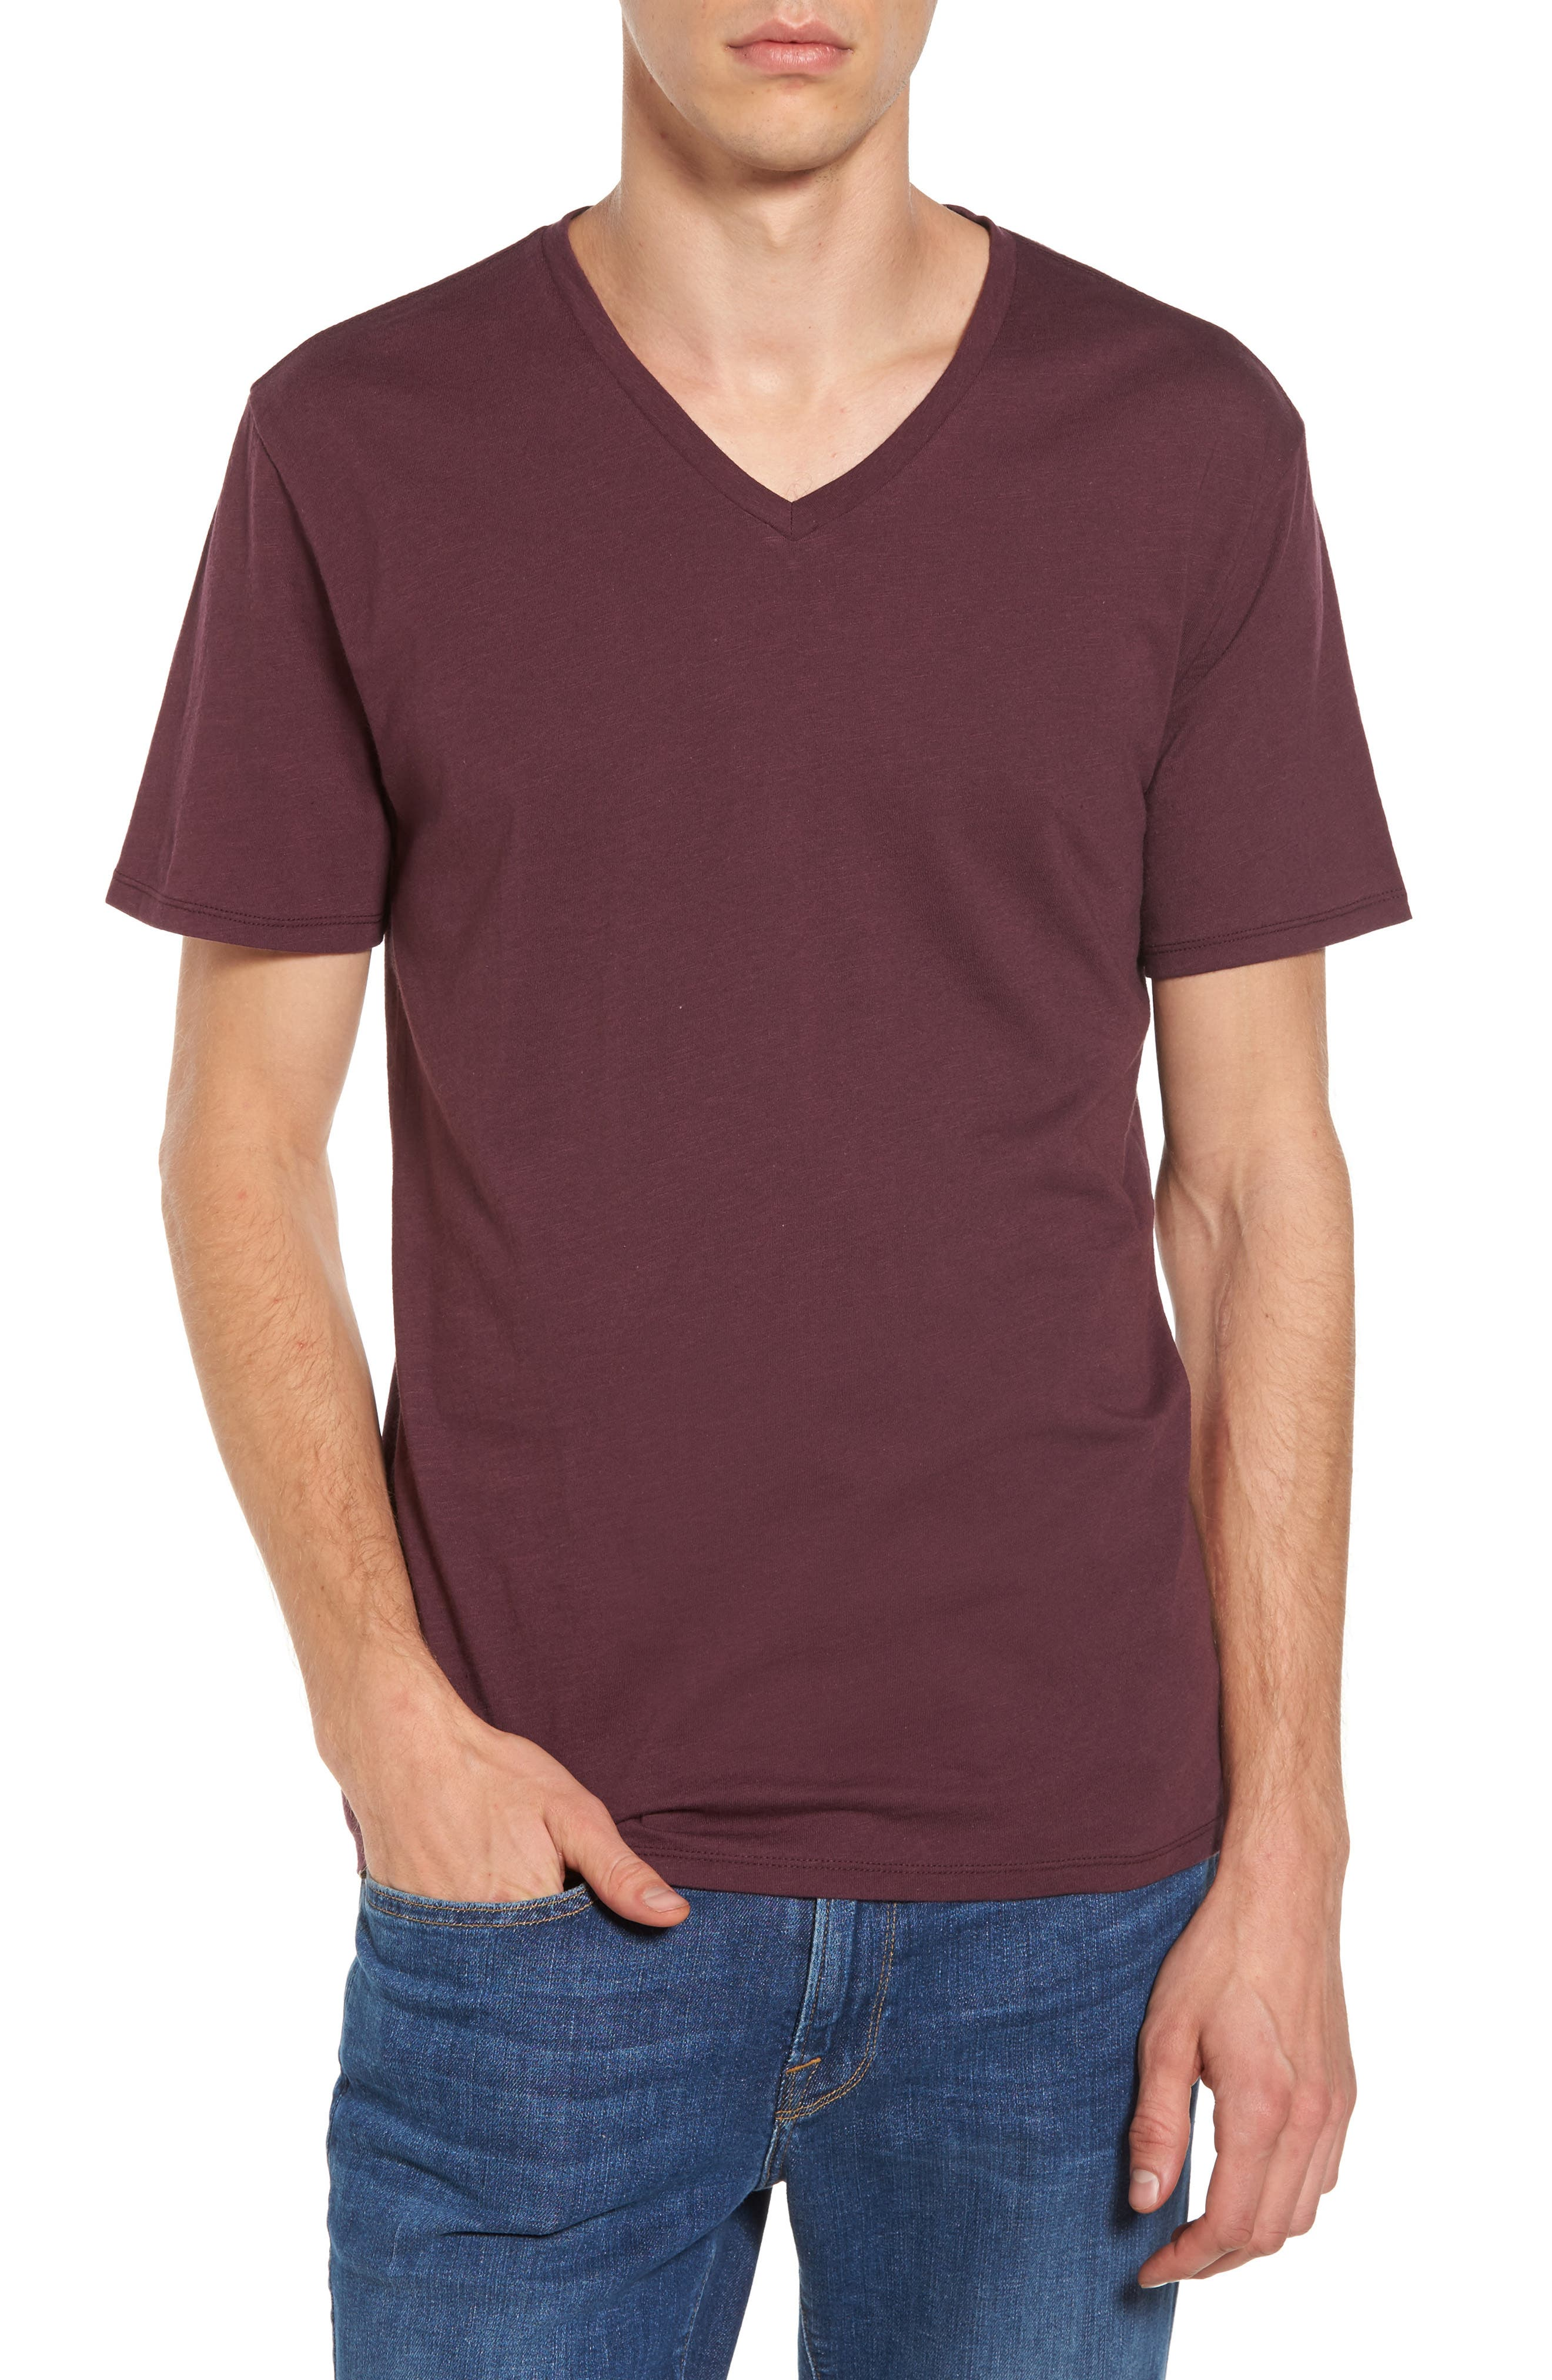 Alternate Image 1 Selected - The Rail Slub Cotton V-Neck T-Shirt (2 for $30)